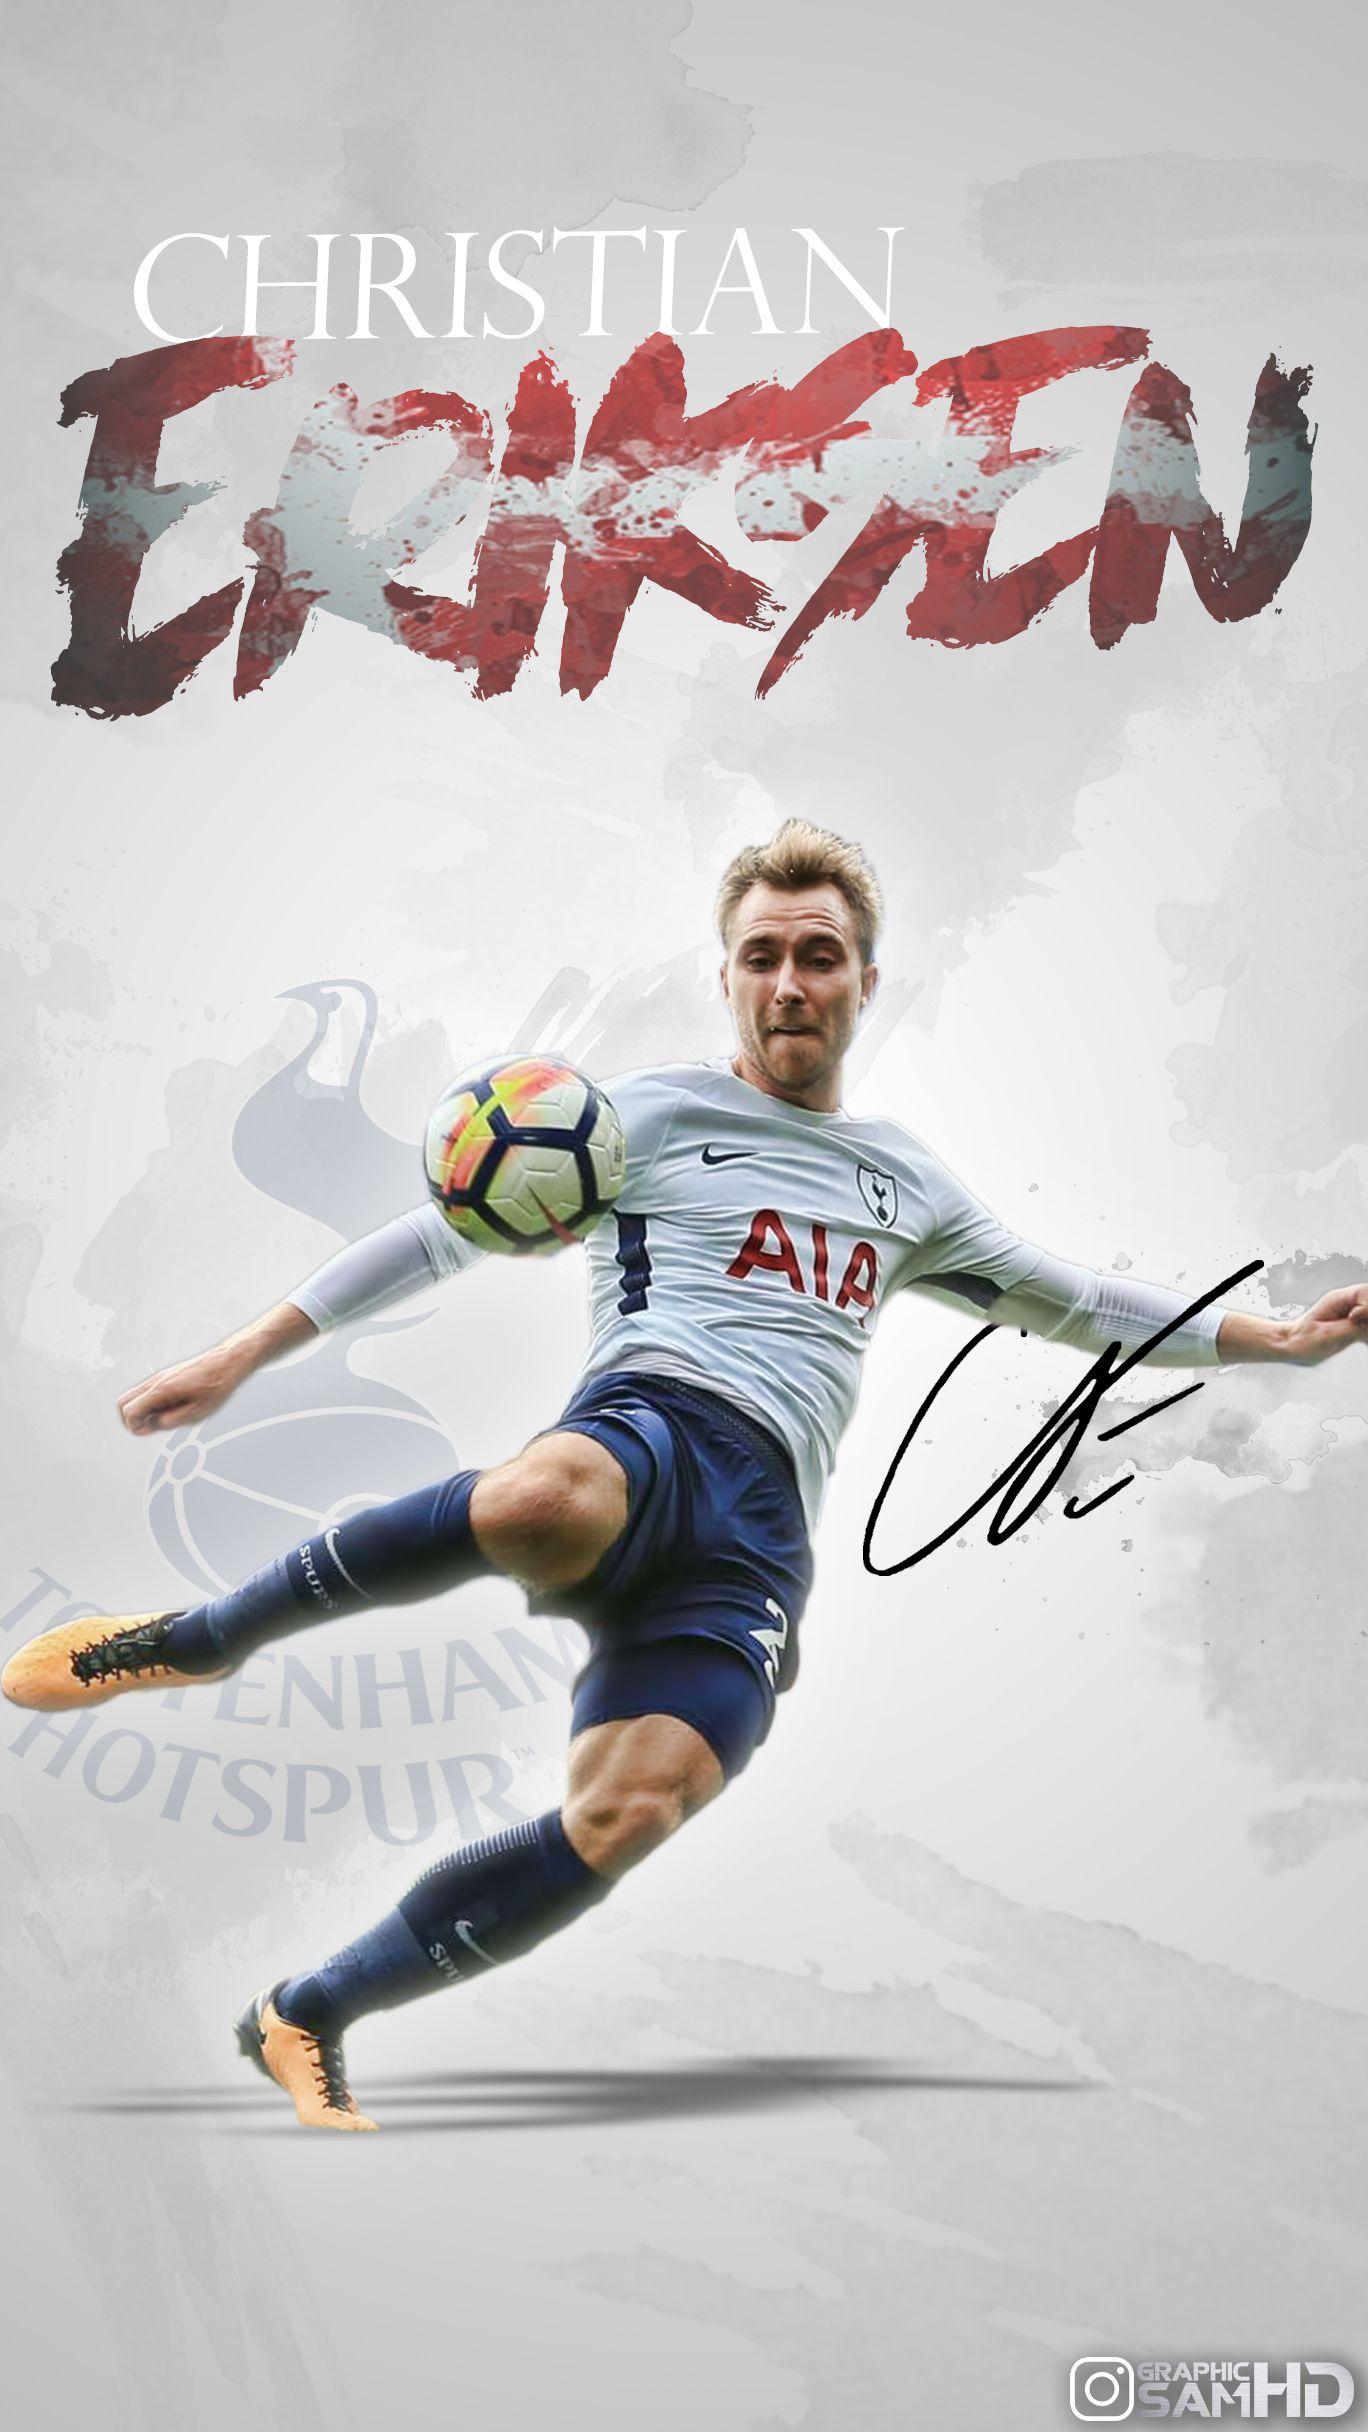 6cc16c39808bcd Christian Eriksen Phone Wallpaper 2017 2018. Christian Eriksen Phone  Wallpaper 2017 2018 Tottenham Hotspur ...